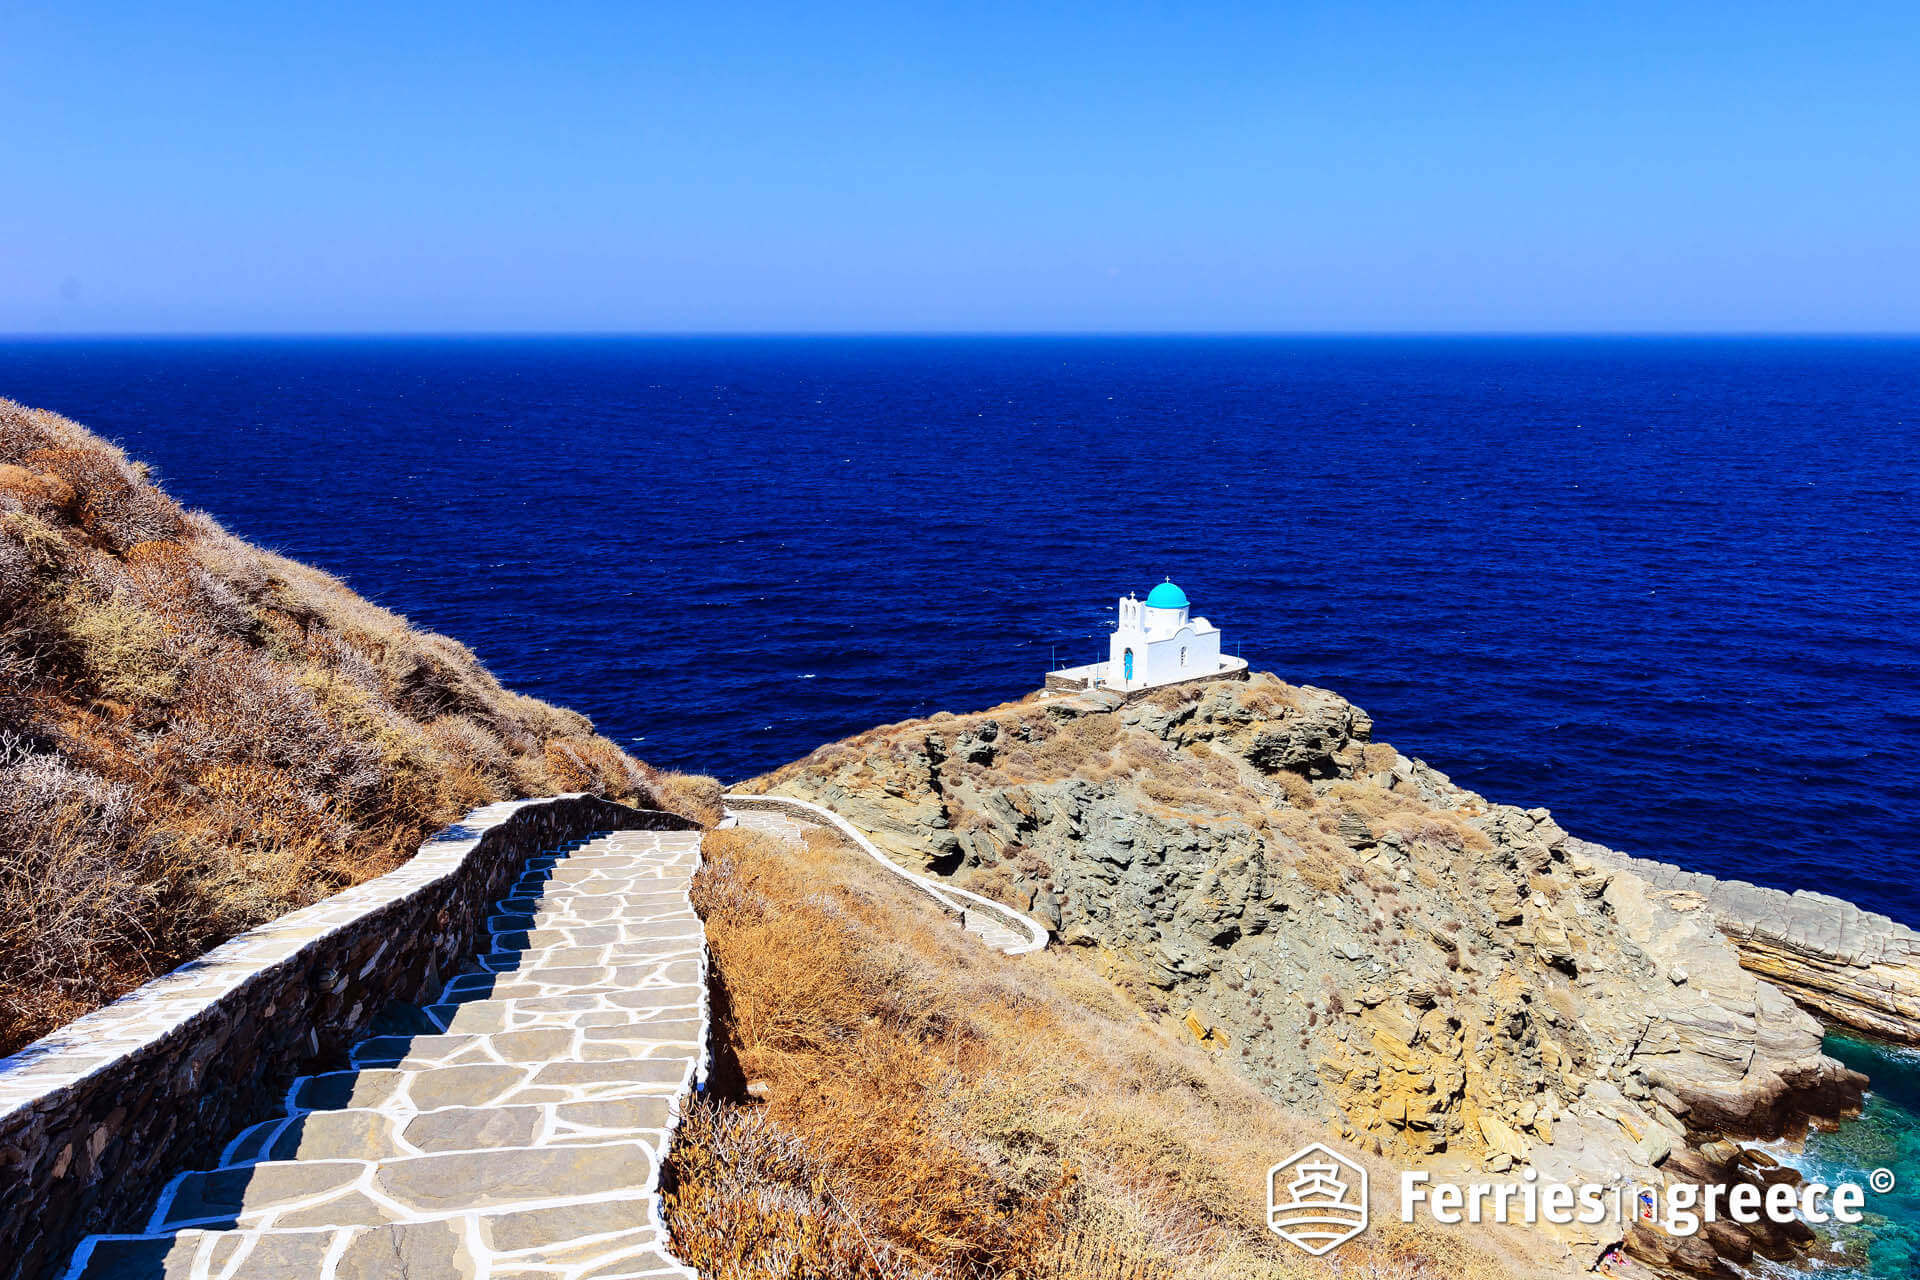 Ferry to Sifnos Ferriesingreececom